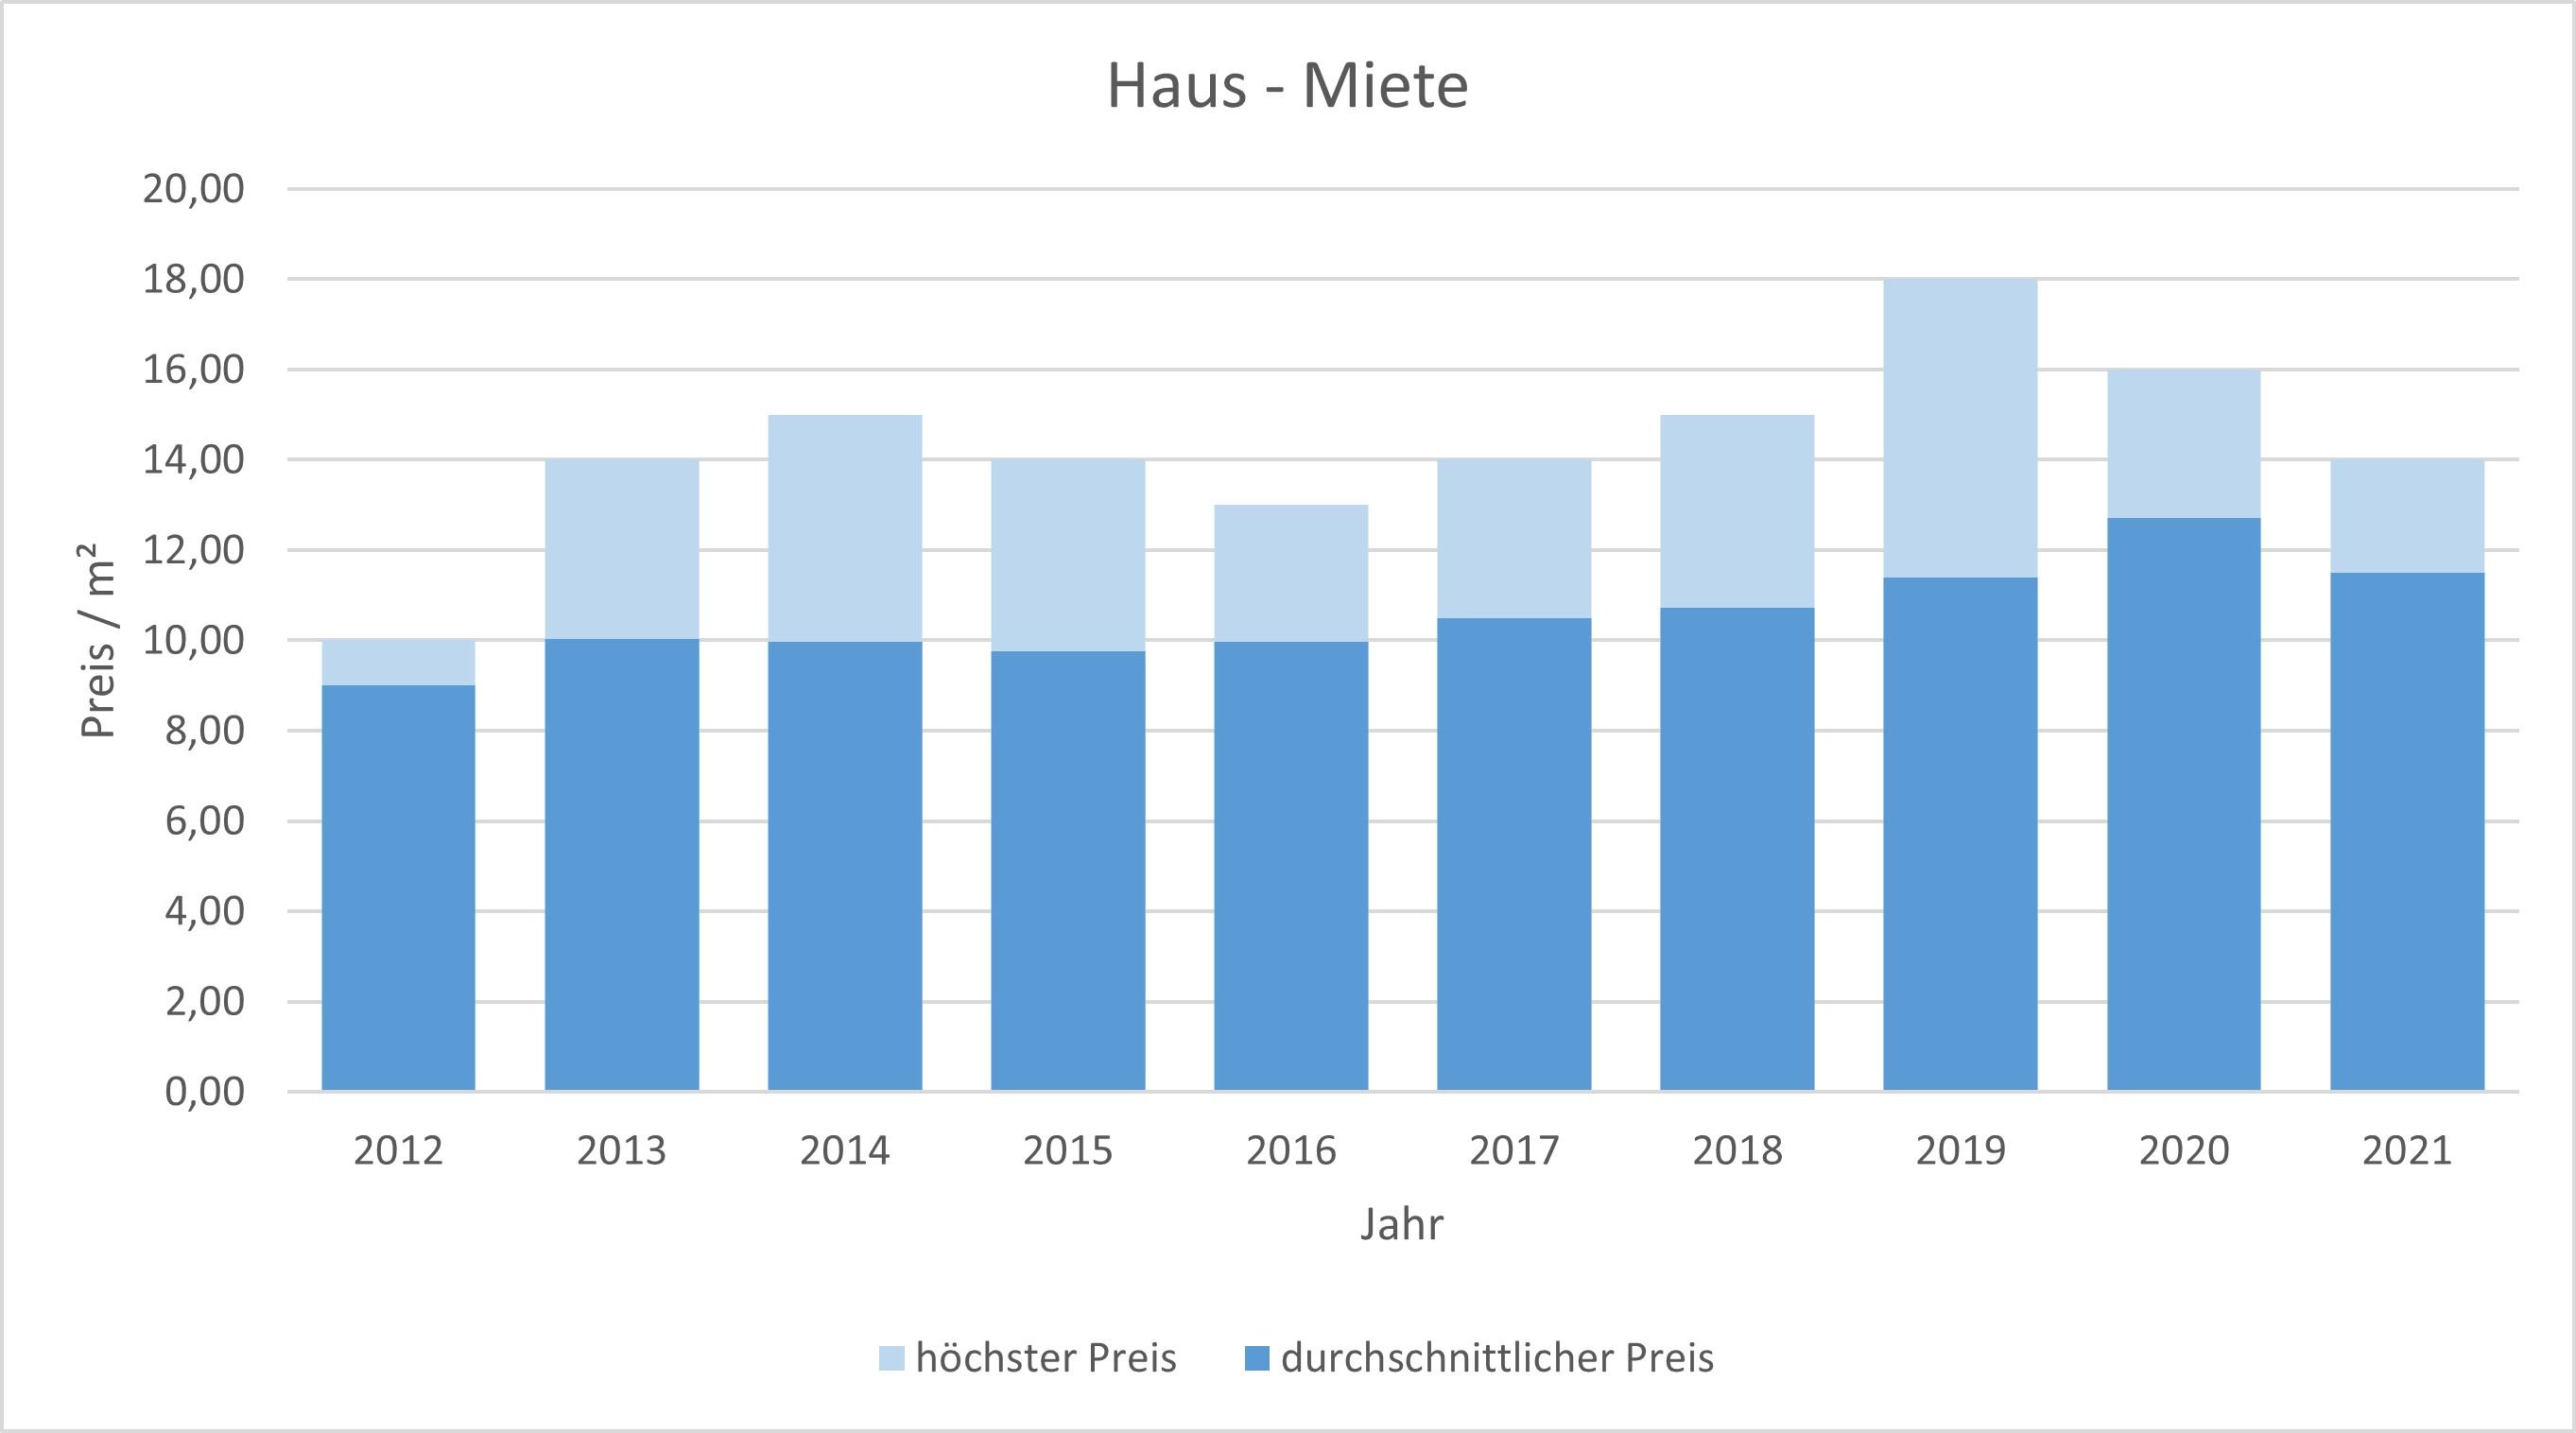 Bad Tölz Makler Haus vermieten mieten Preis Bewertung 2019, 2020, 2021